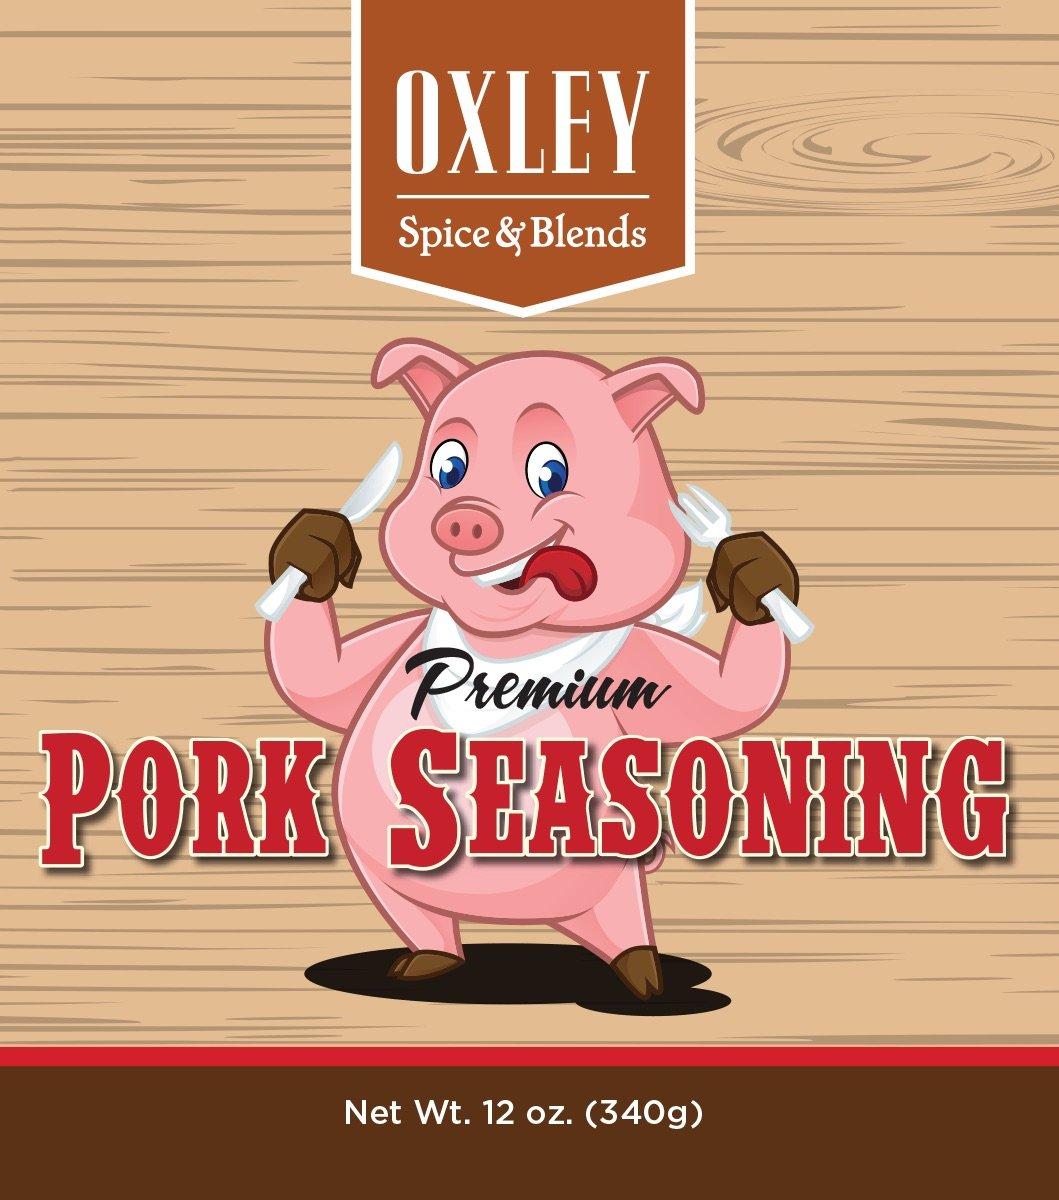 Premium Pork Meat Seasoning, 12 Ounce, For BBQ, Ribs, Pork Butt or Shoulder, Pork Chops, Tenderloin, BBQ